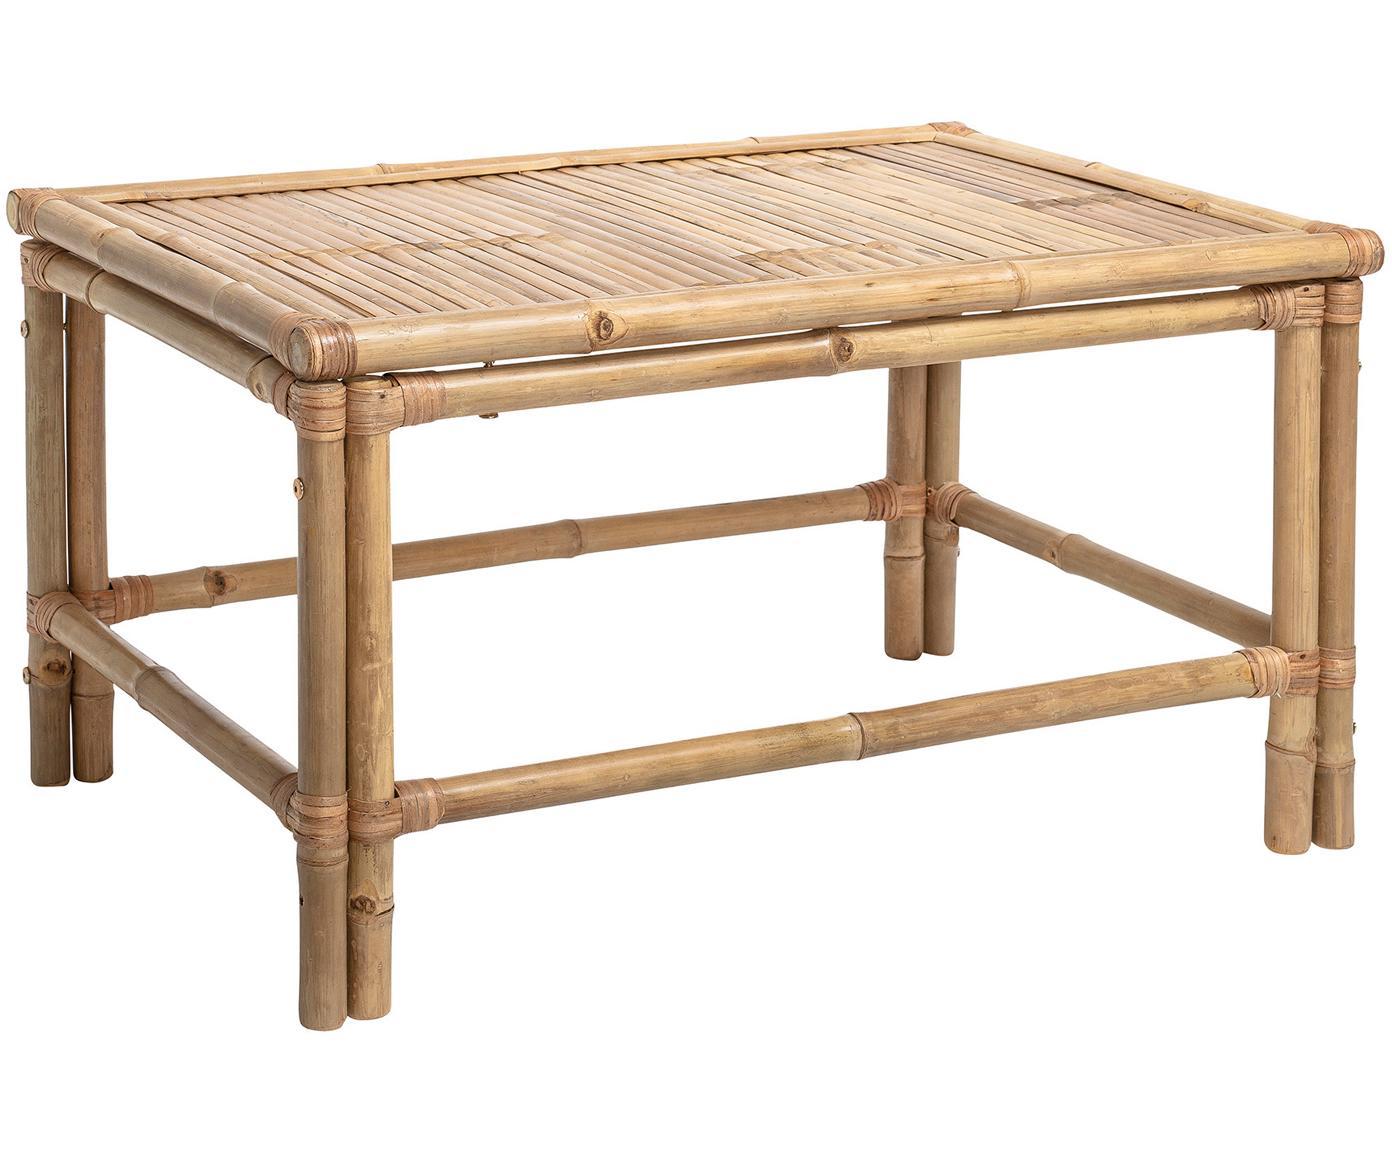 Salontafel Sole van bamboe, Bamboehout, Beige, 90 x 60 cm